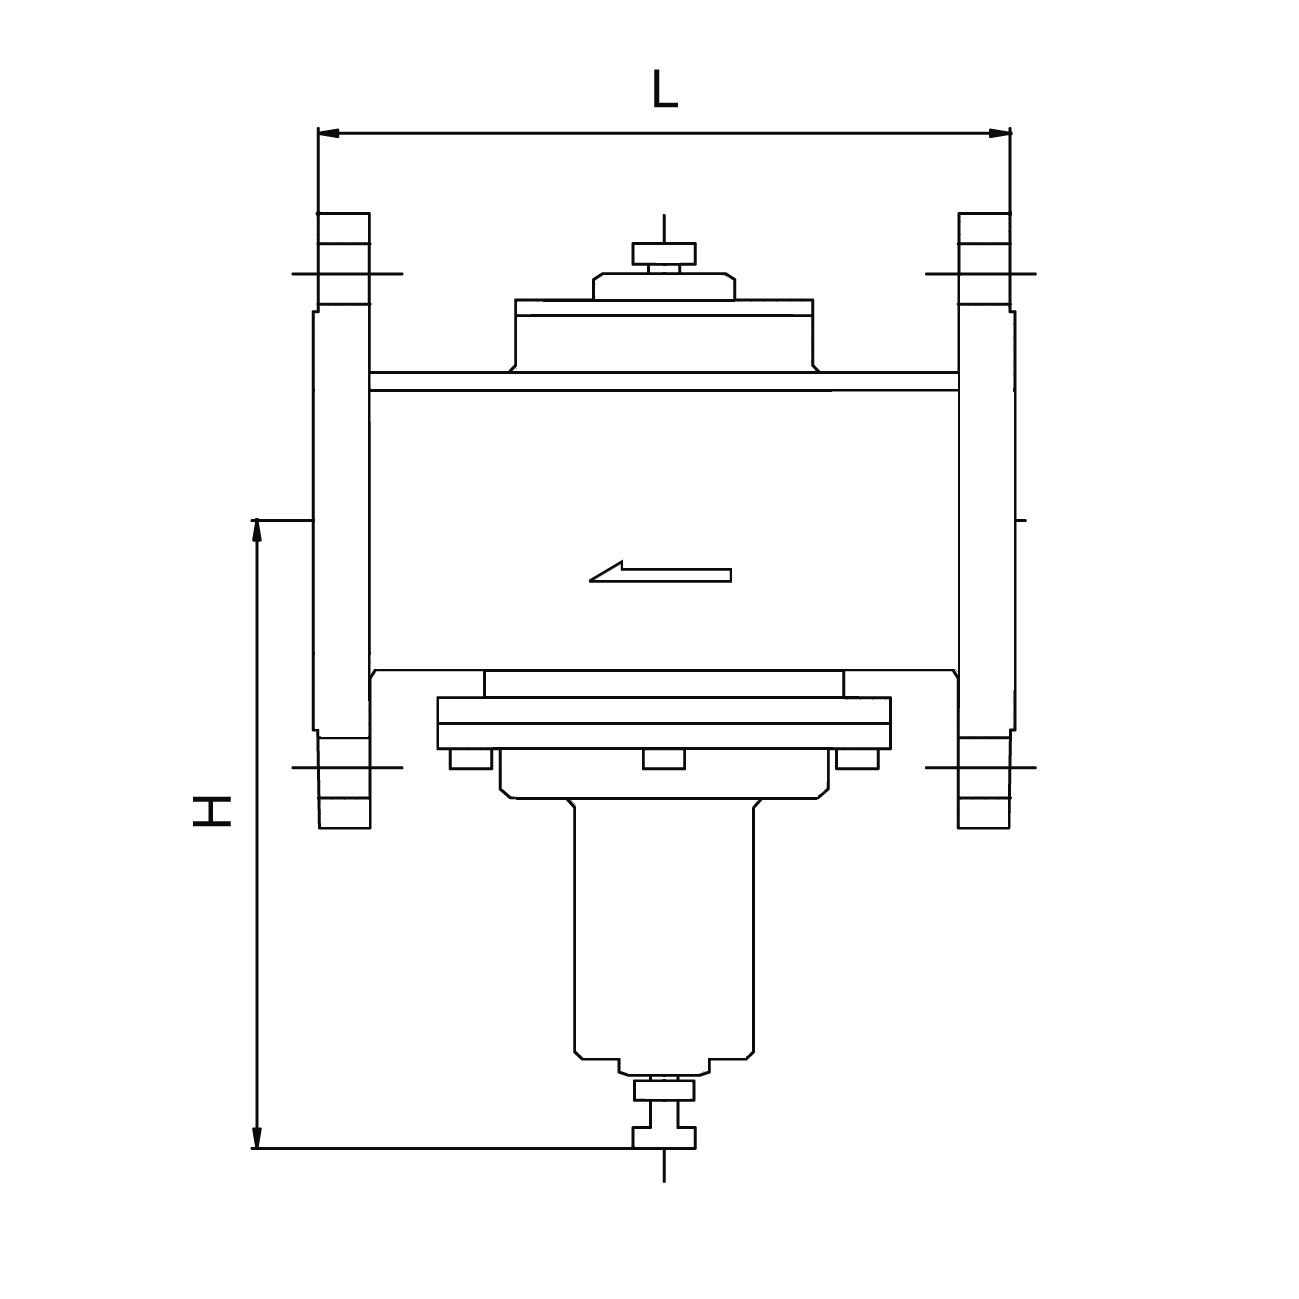 2230 flange blueprint